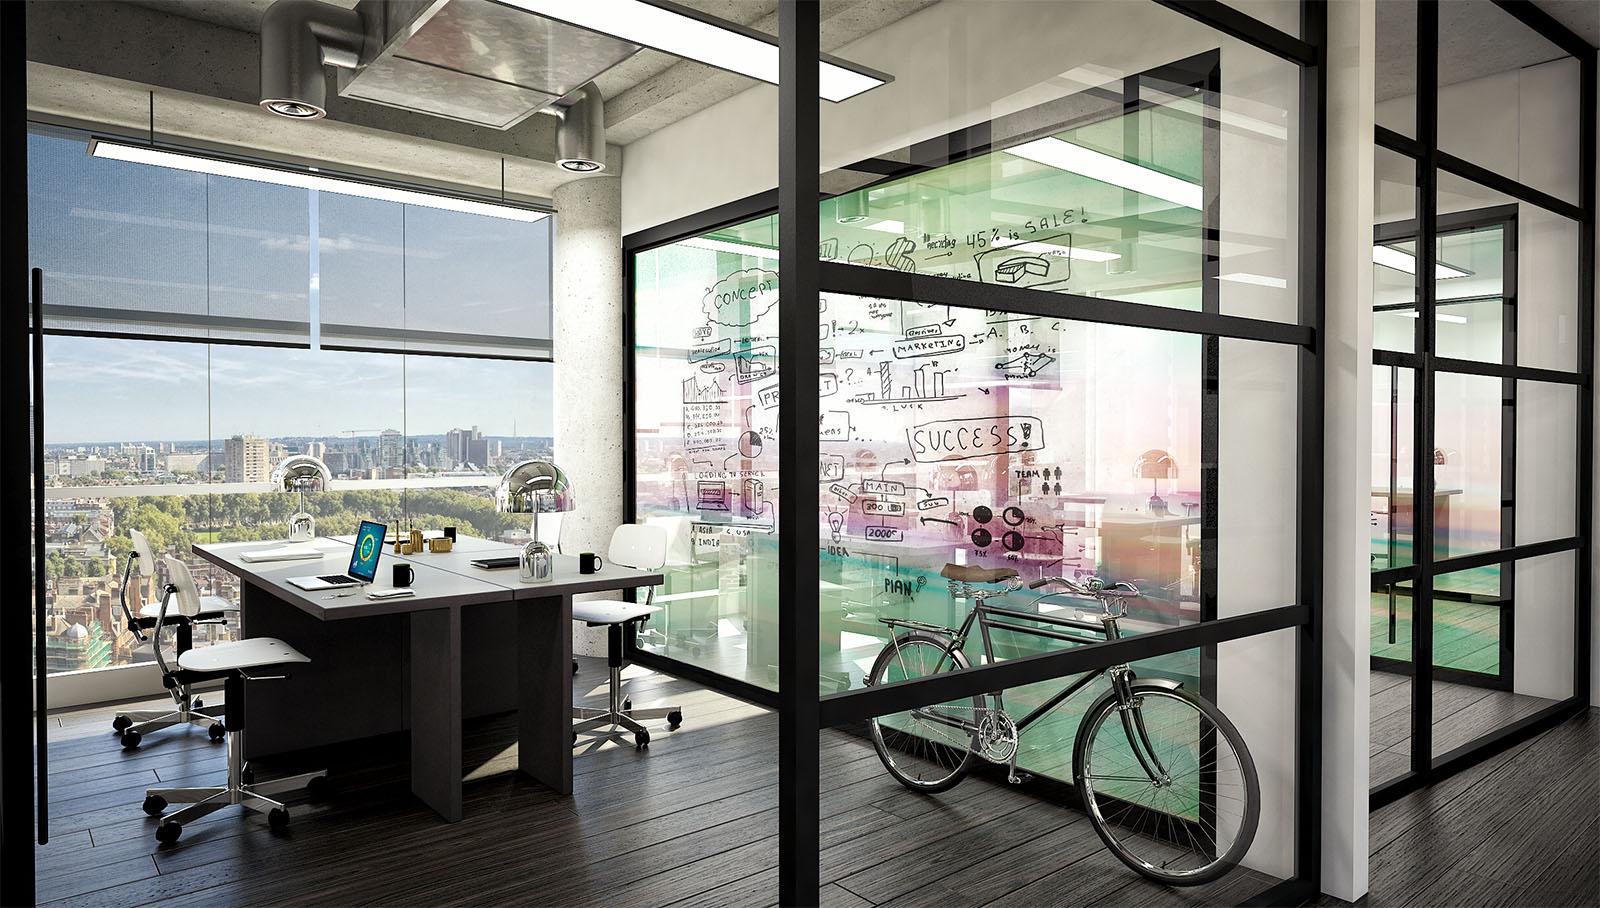 A Look Inside Interchange's New Coworking Space in London